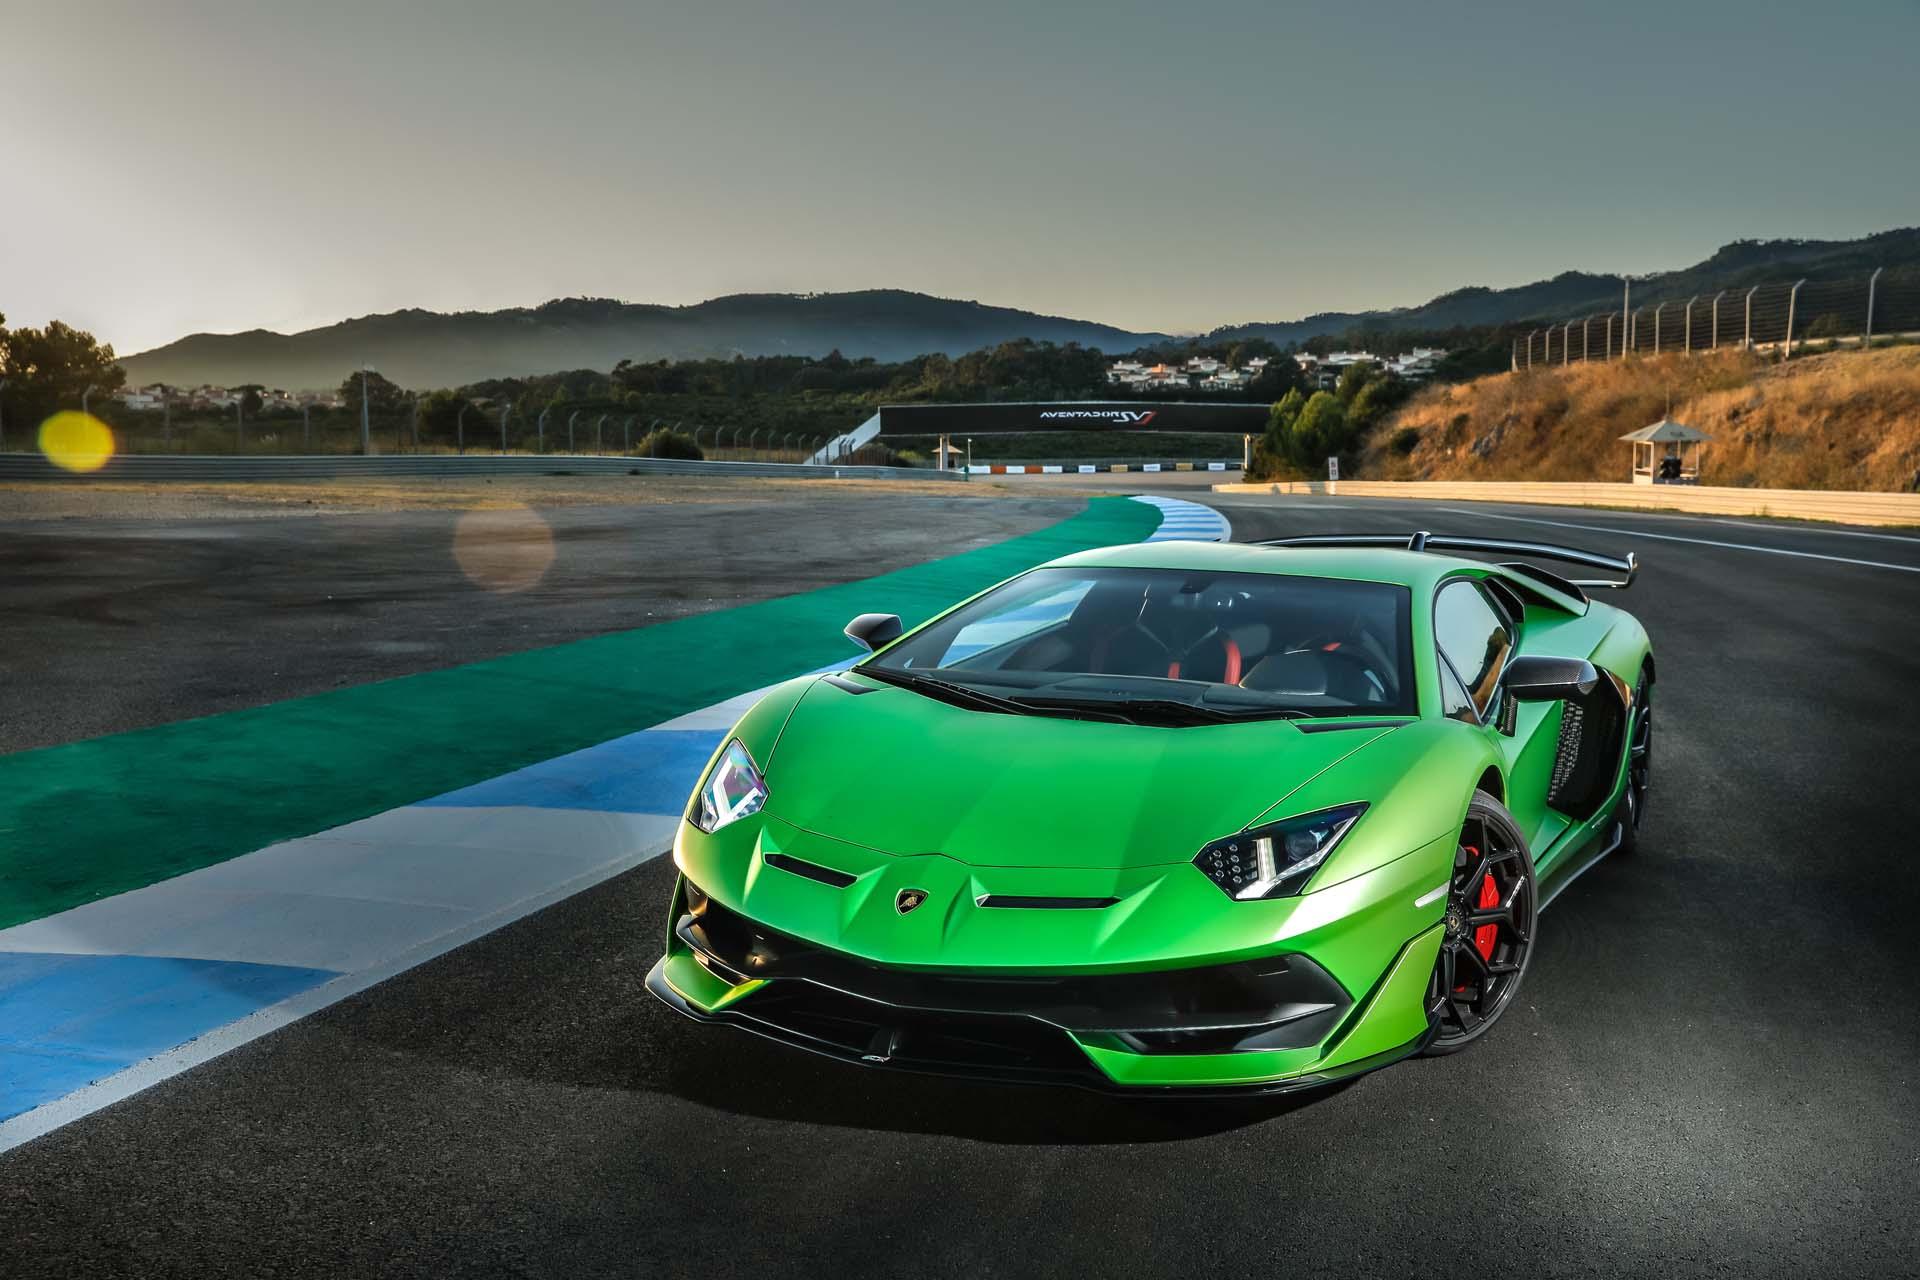 2019 Lamborghini Aventador SVJ Front Wallpapers #29 of 241